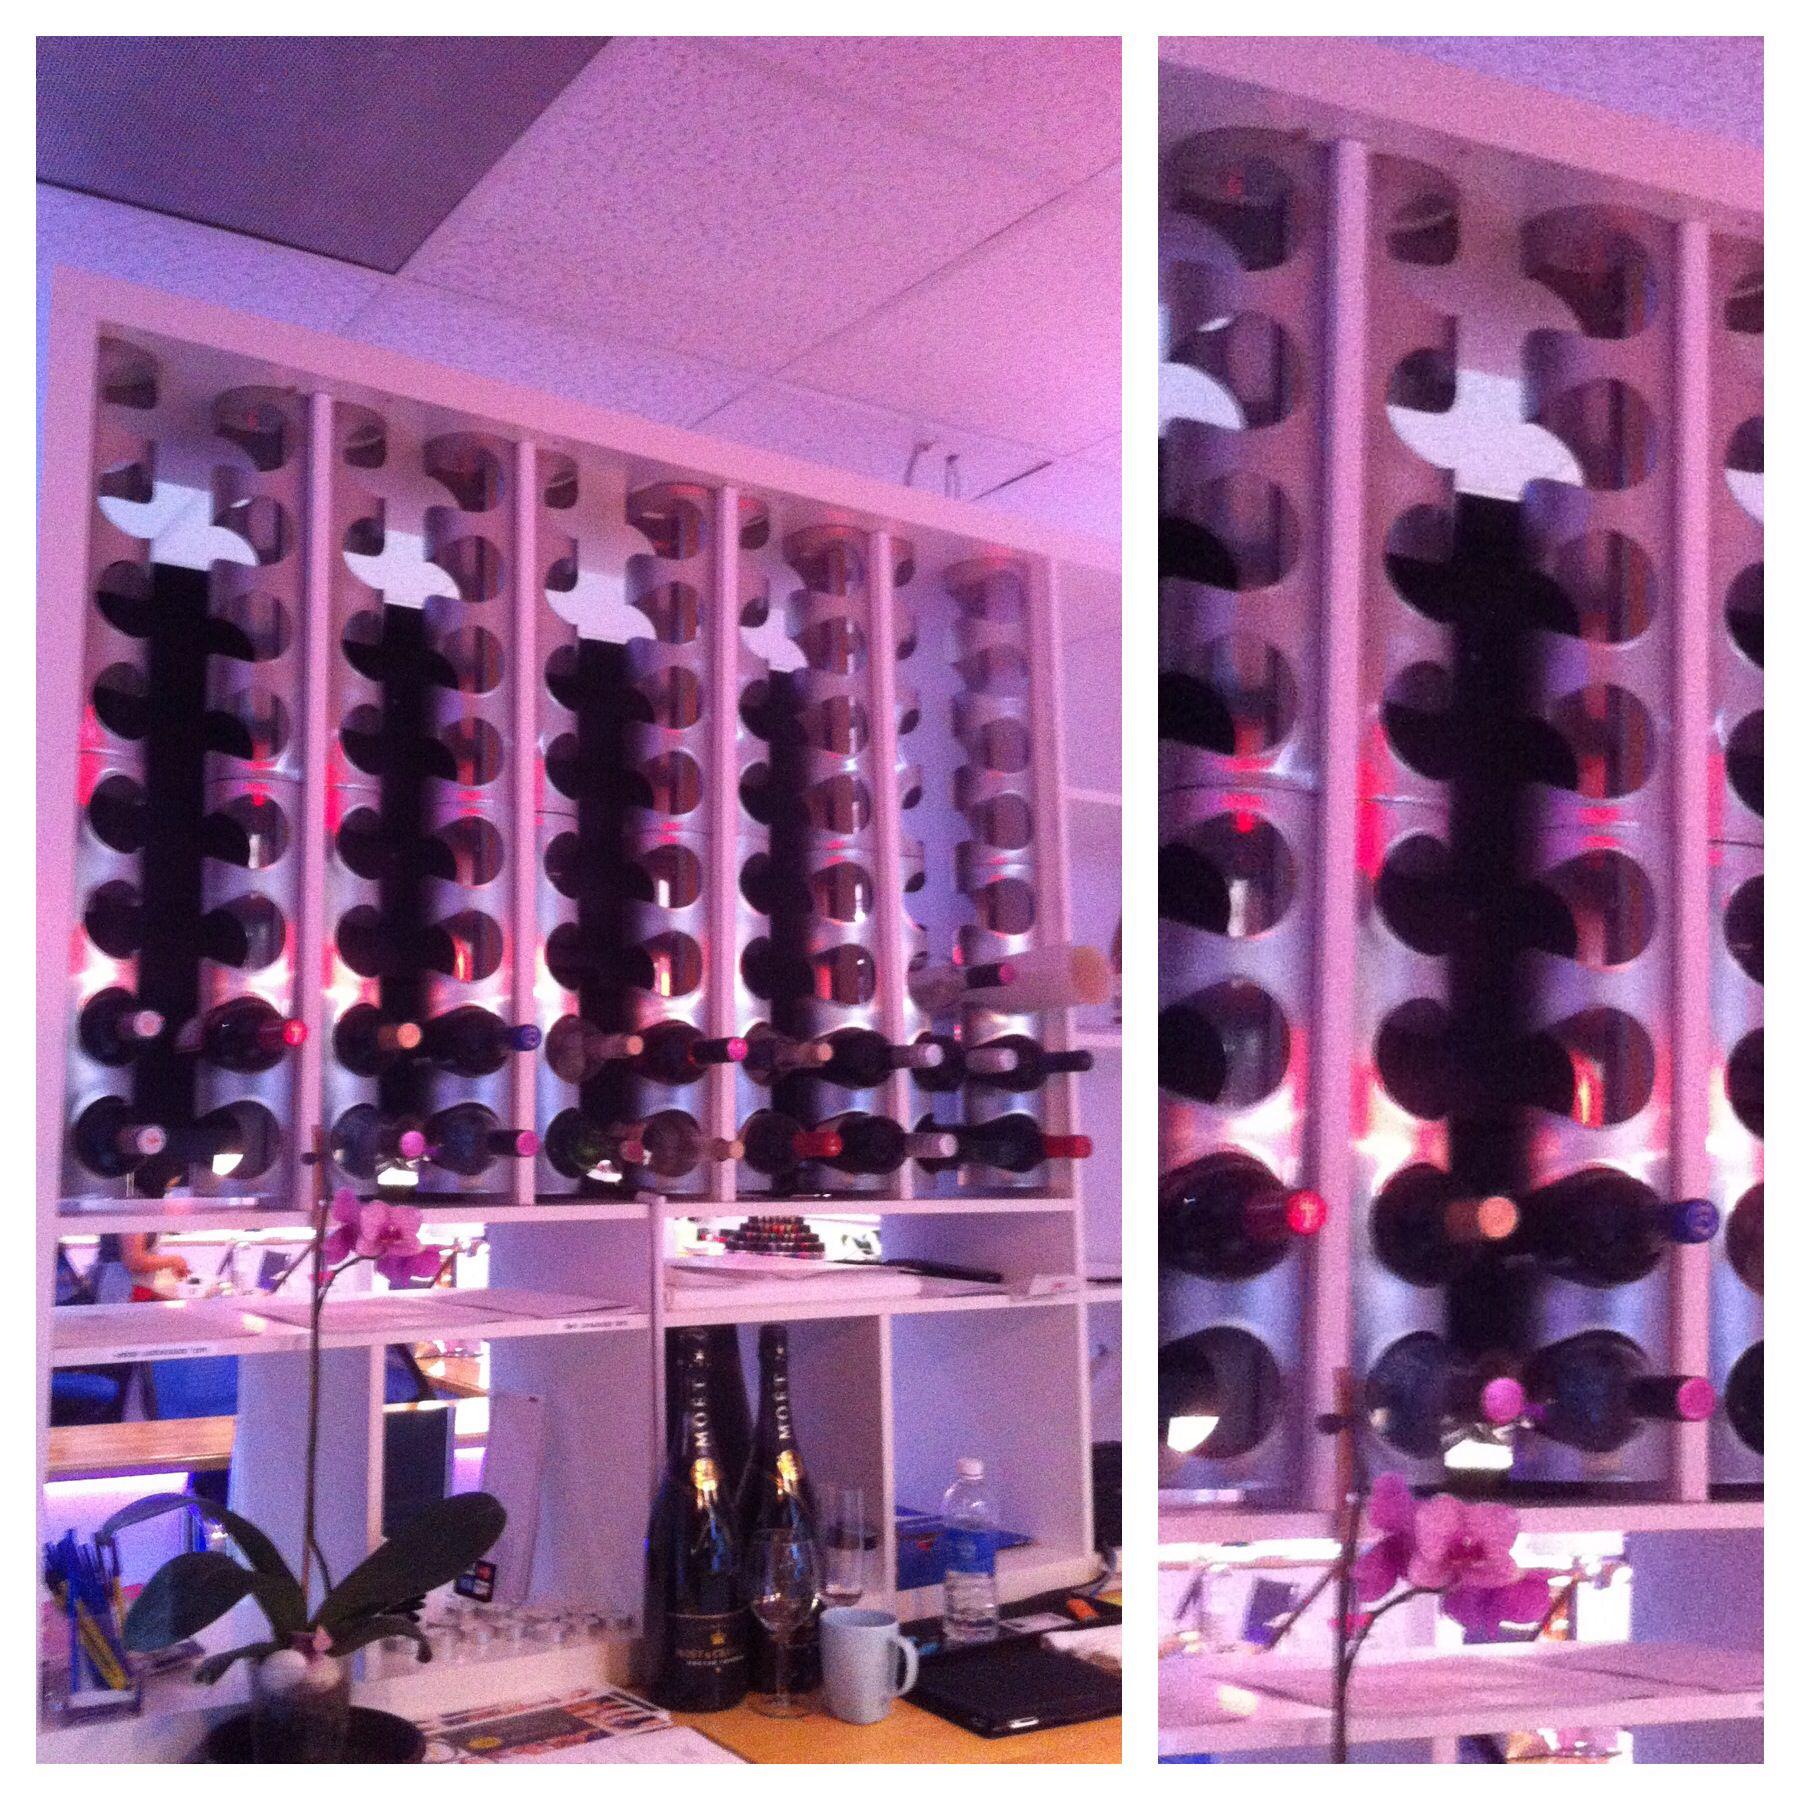 A different way to install ikea 39 s vurm wine racks for Ikea wine shelf